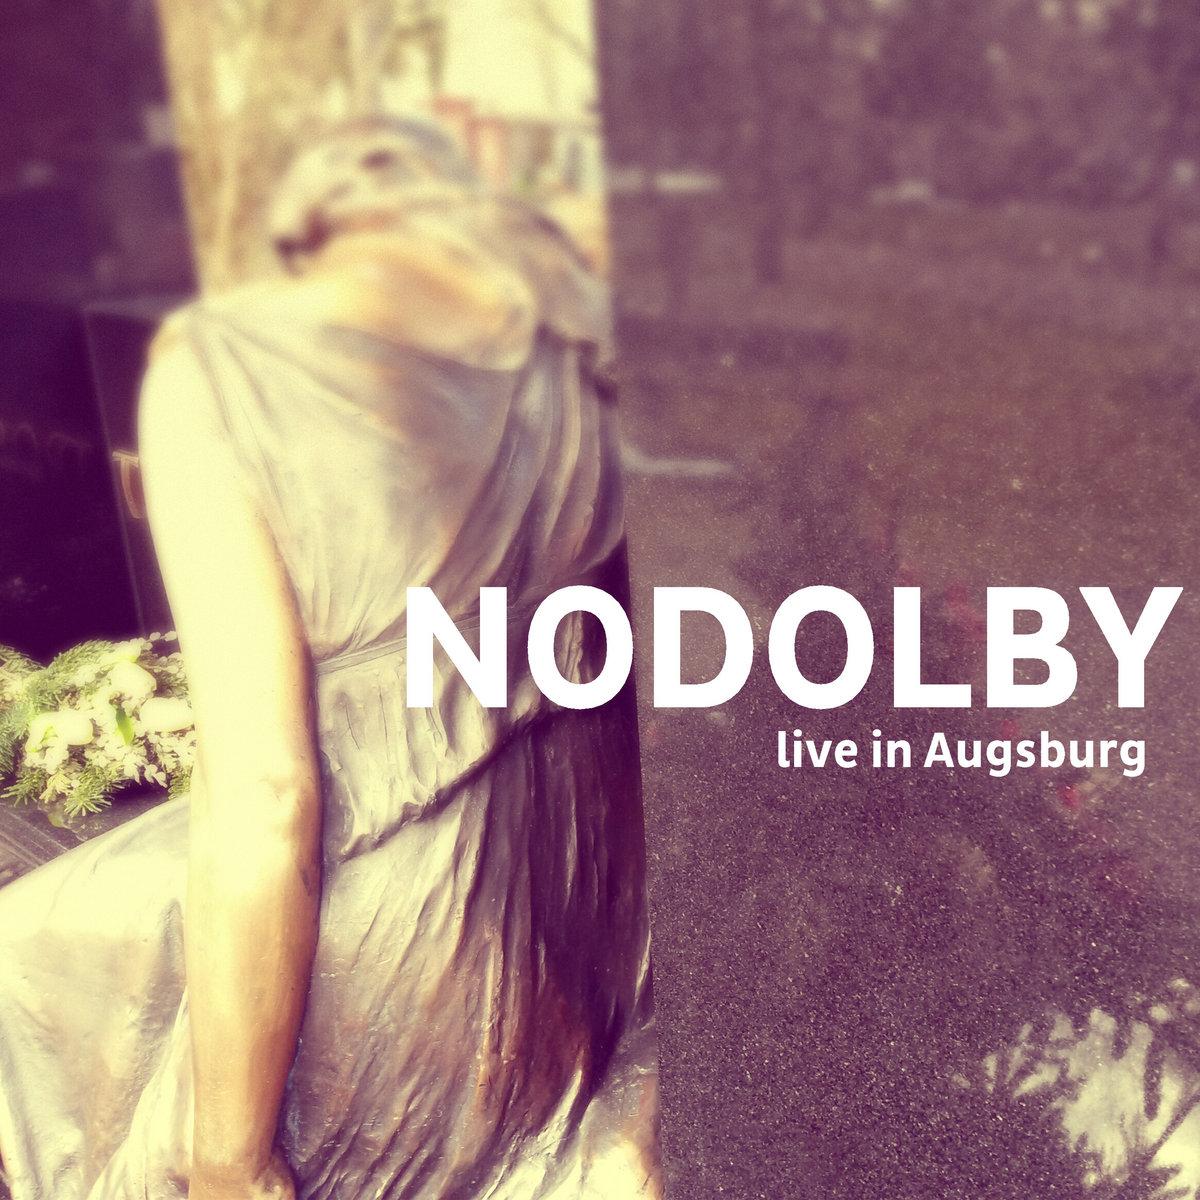 NODOLBY – live in Augsburg